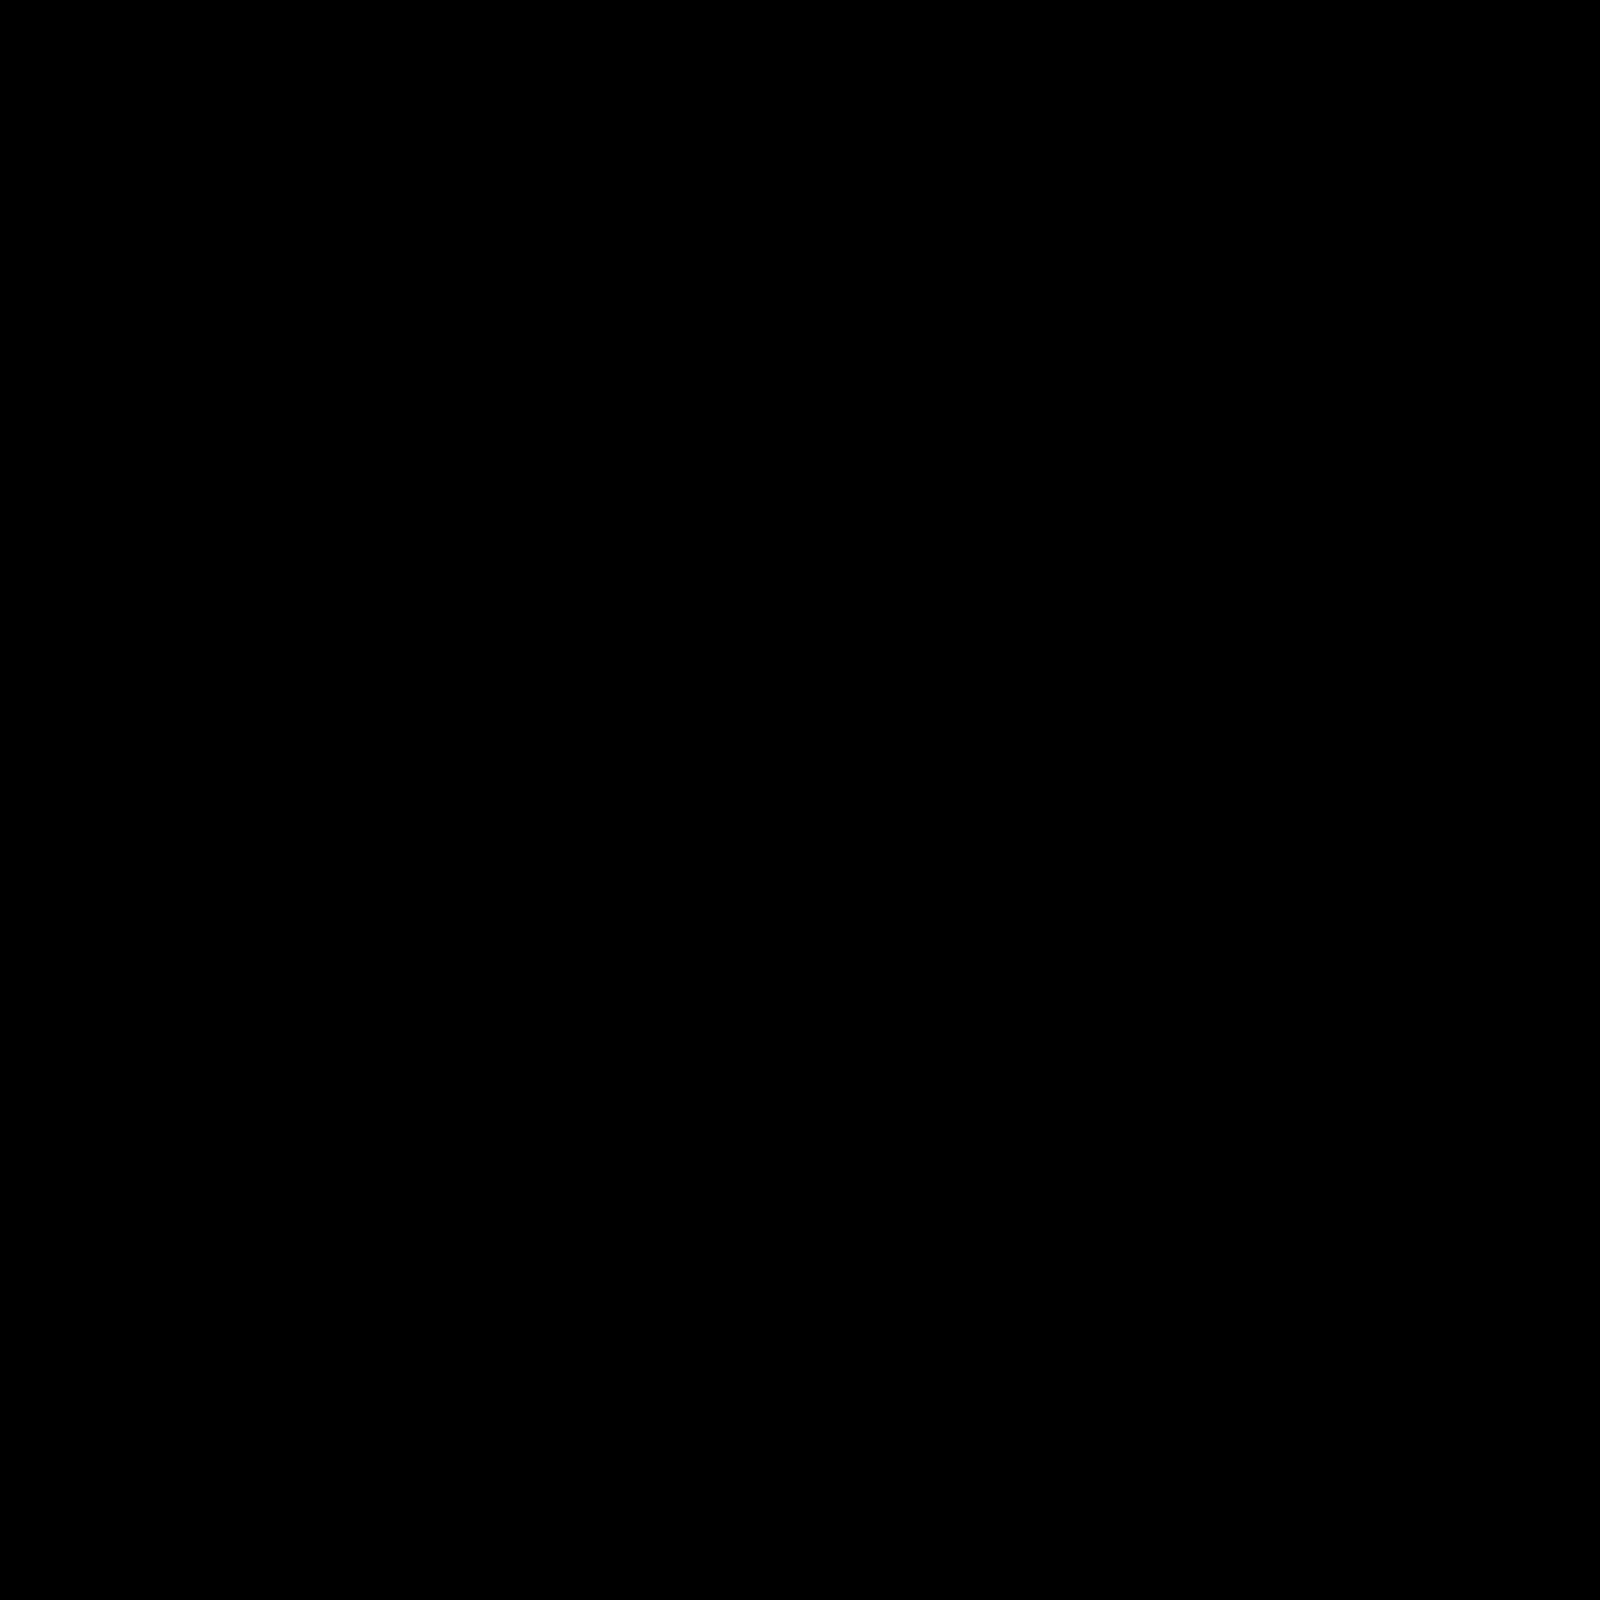 wąsy Larsa Wikinga icon